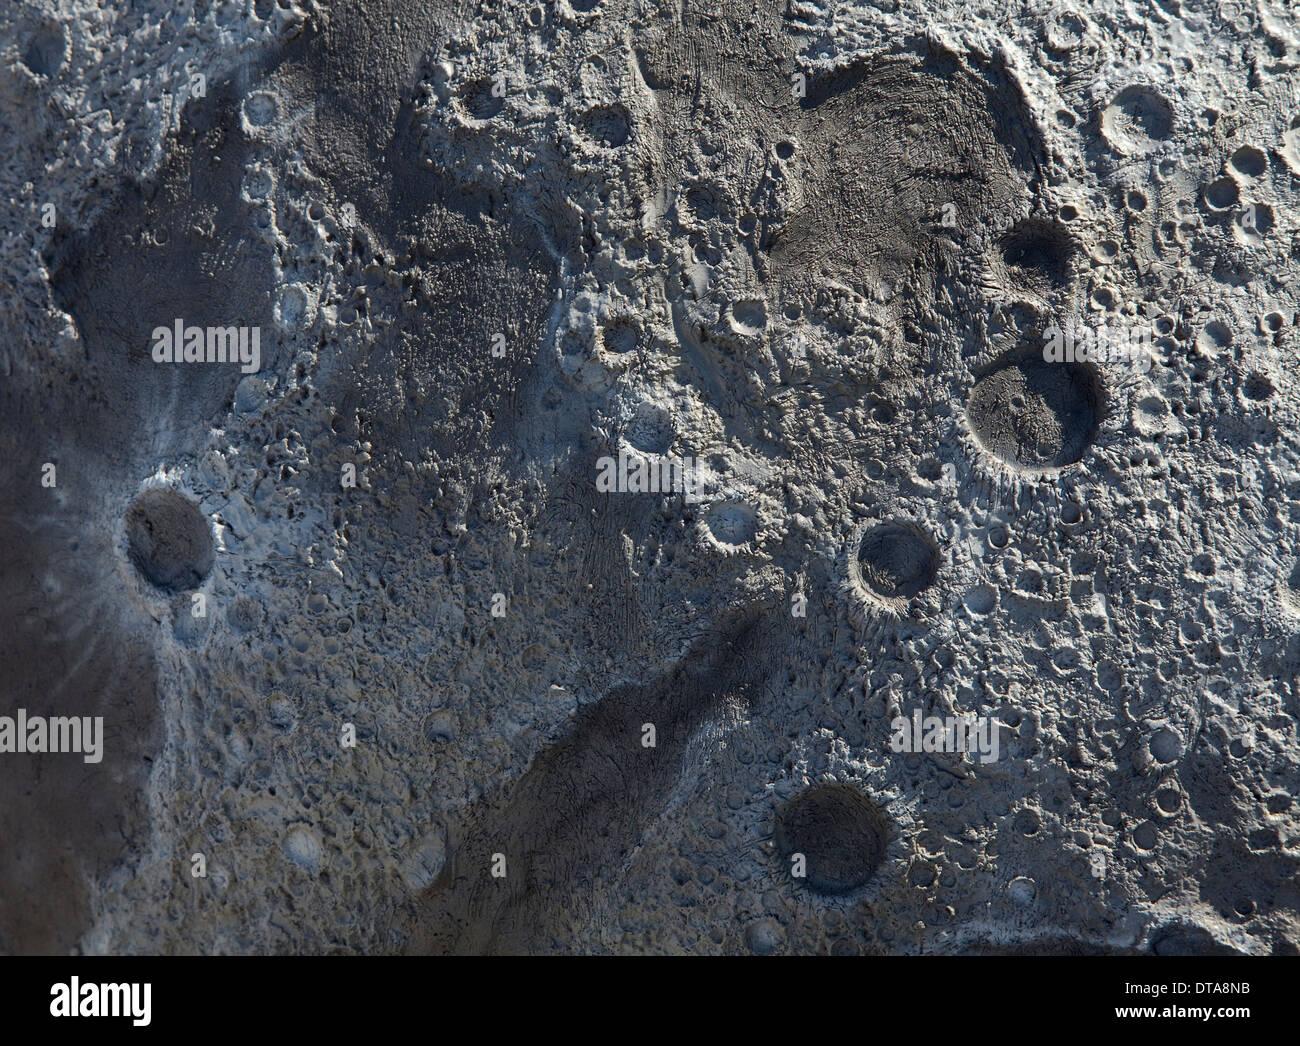 Mond, Erdmond Modell - Stock Image